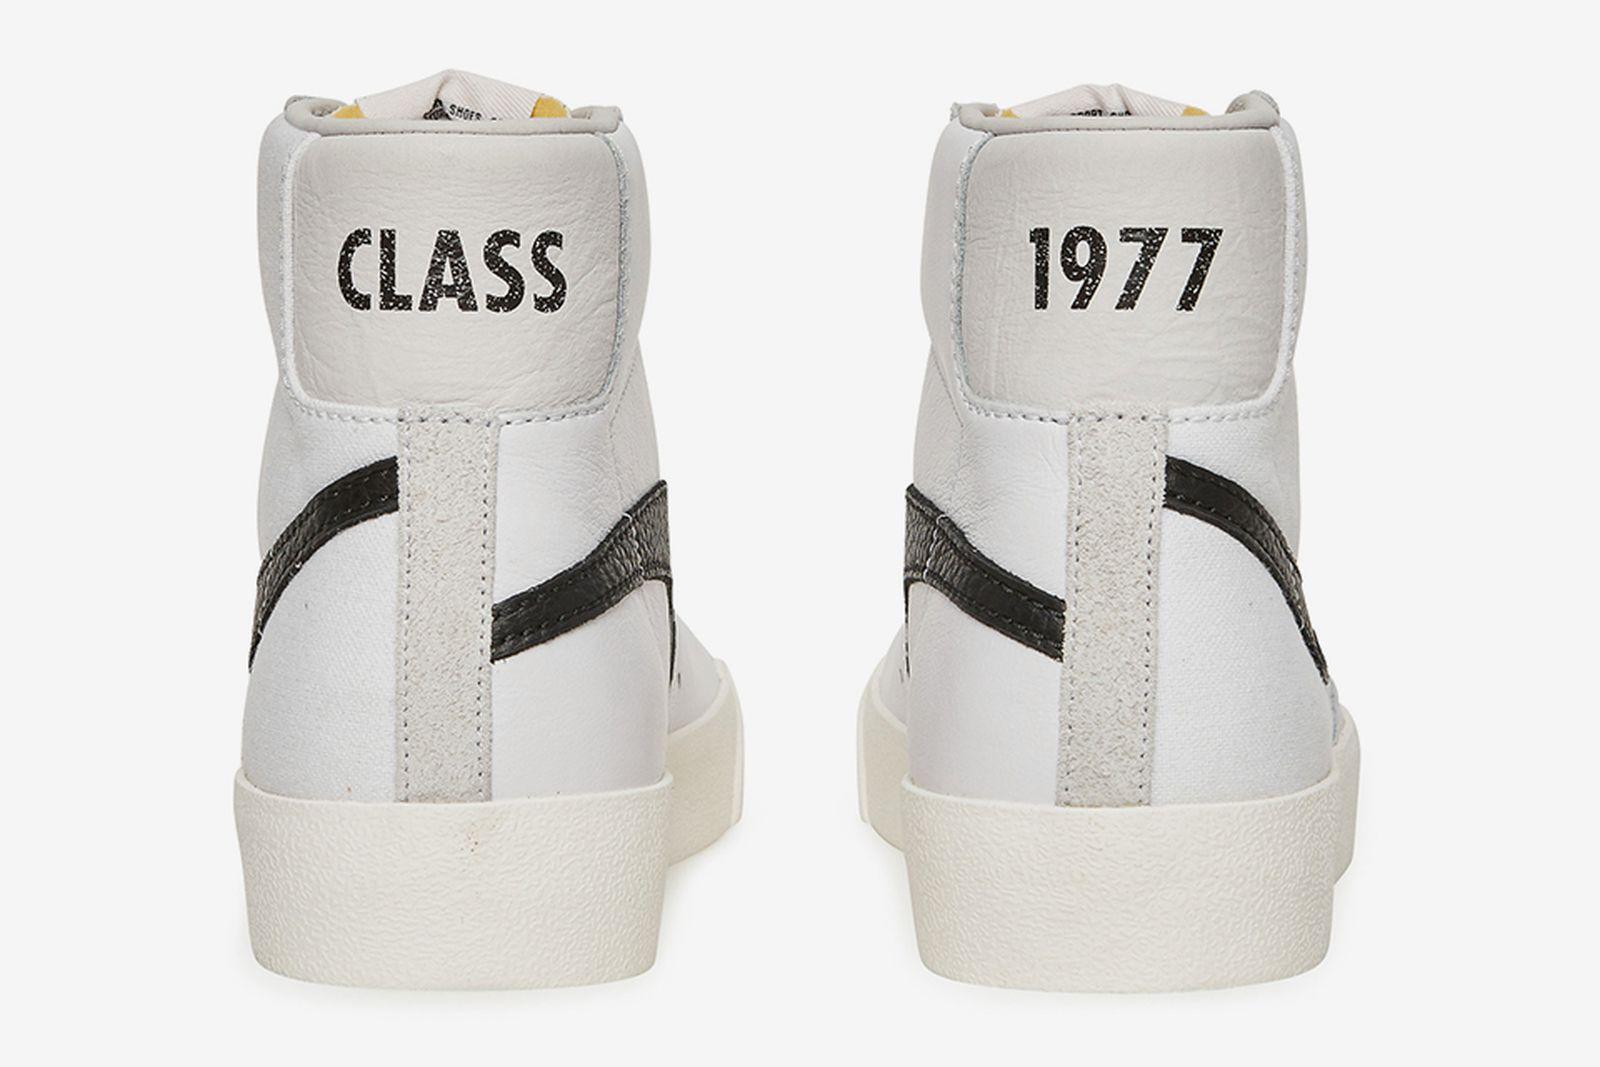 slam jam nike blazer mid class 1977 release date price